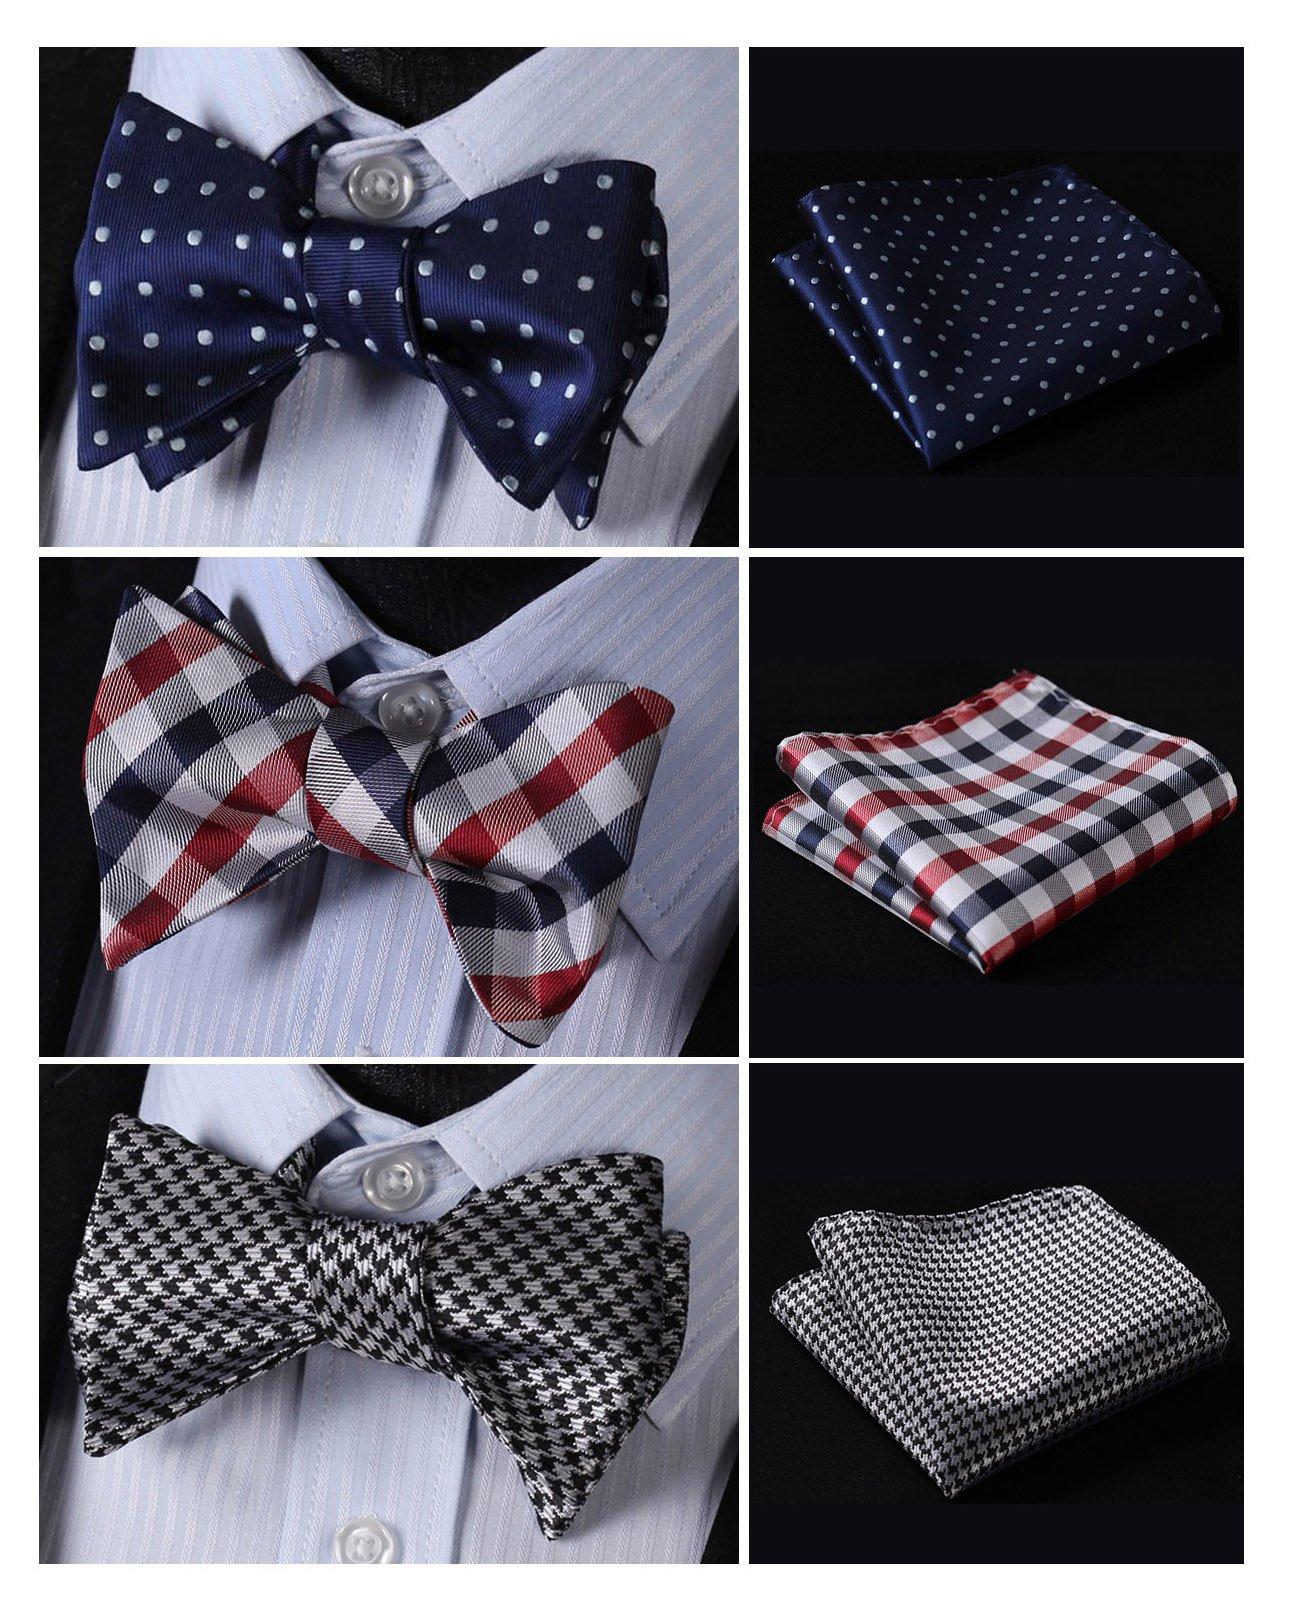 HISDERN 3pcs Mixed Design Classic Men's Self-Tie Bow tie & Pocket Square - Multiple Sets,B3-05,One Size